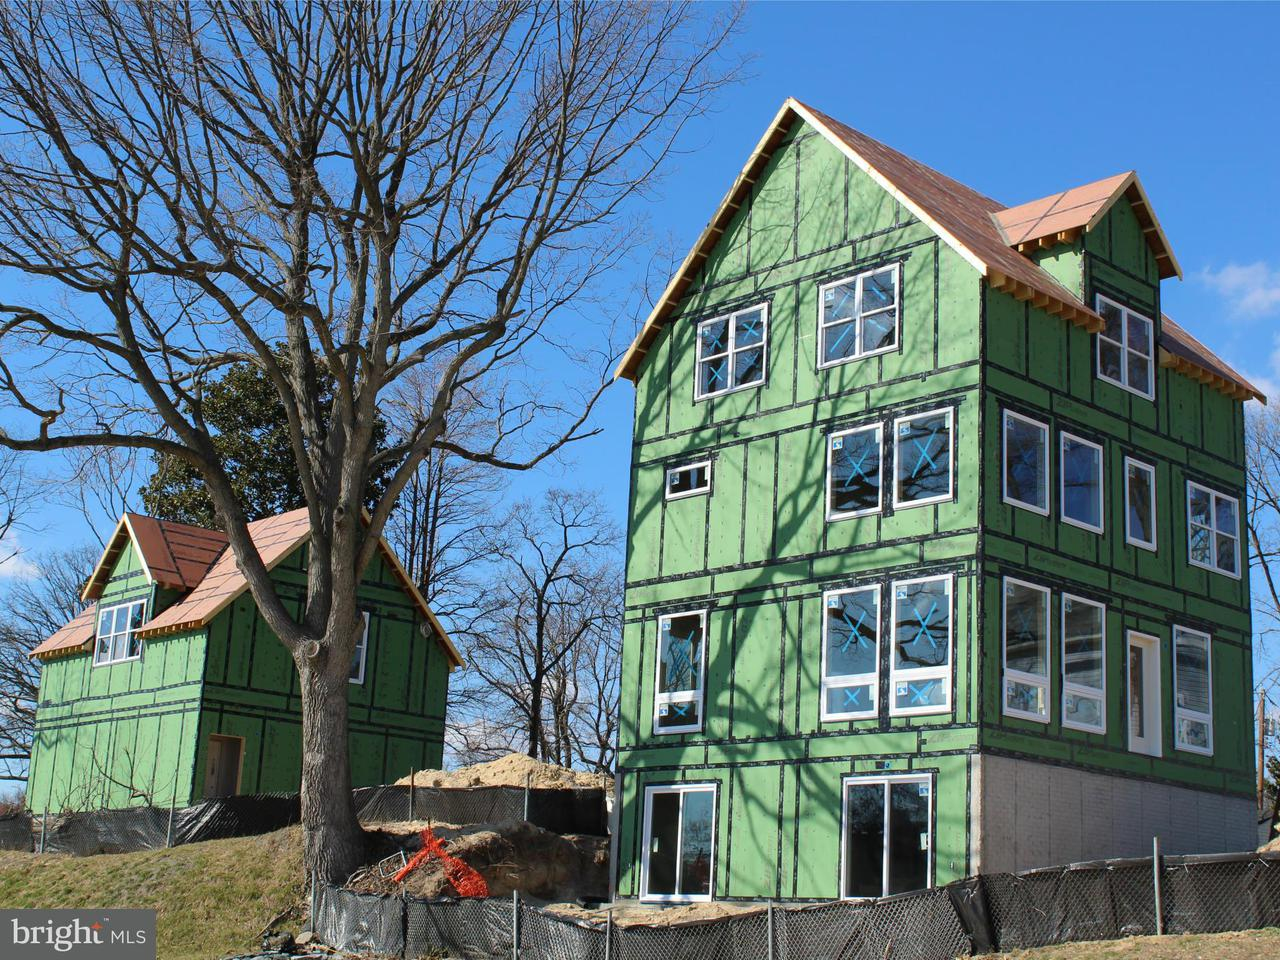 Single Family Home for Sale at 52 JOHNSON Road 52 JOHNSON Road Pasadena, Maryland 21122 United States